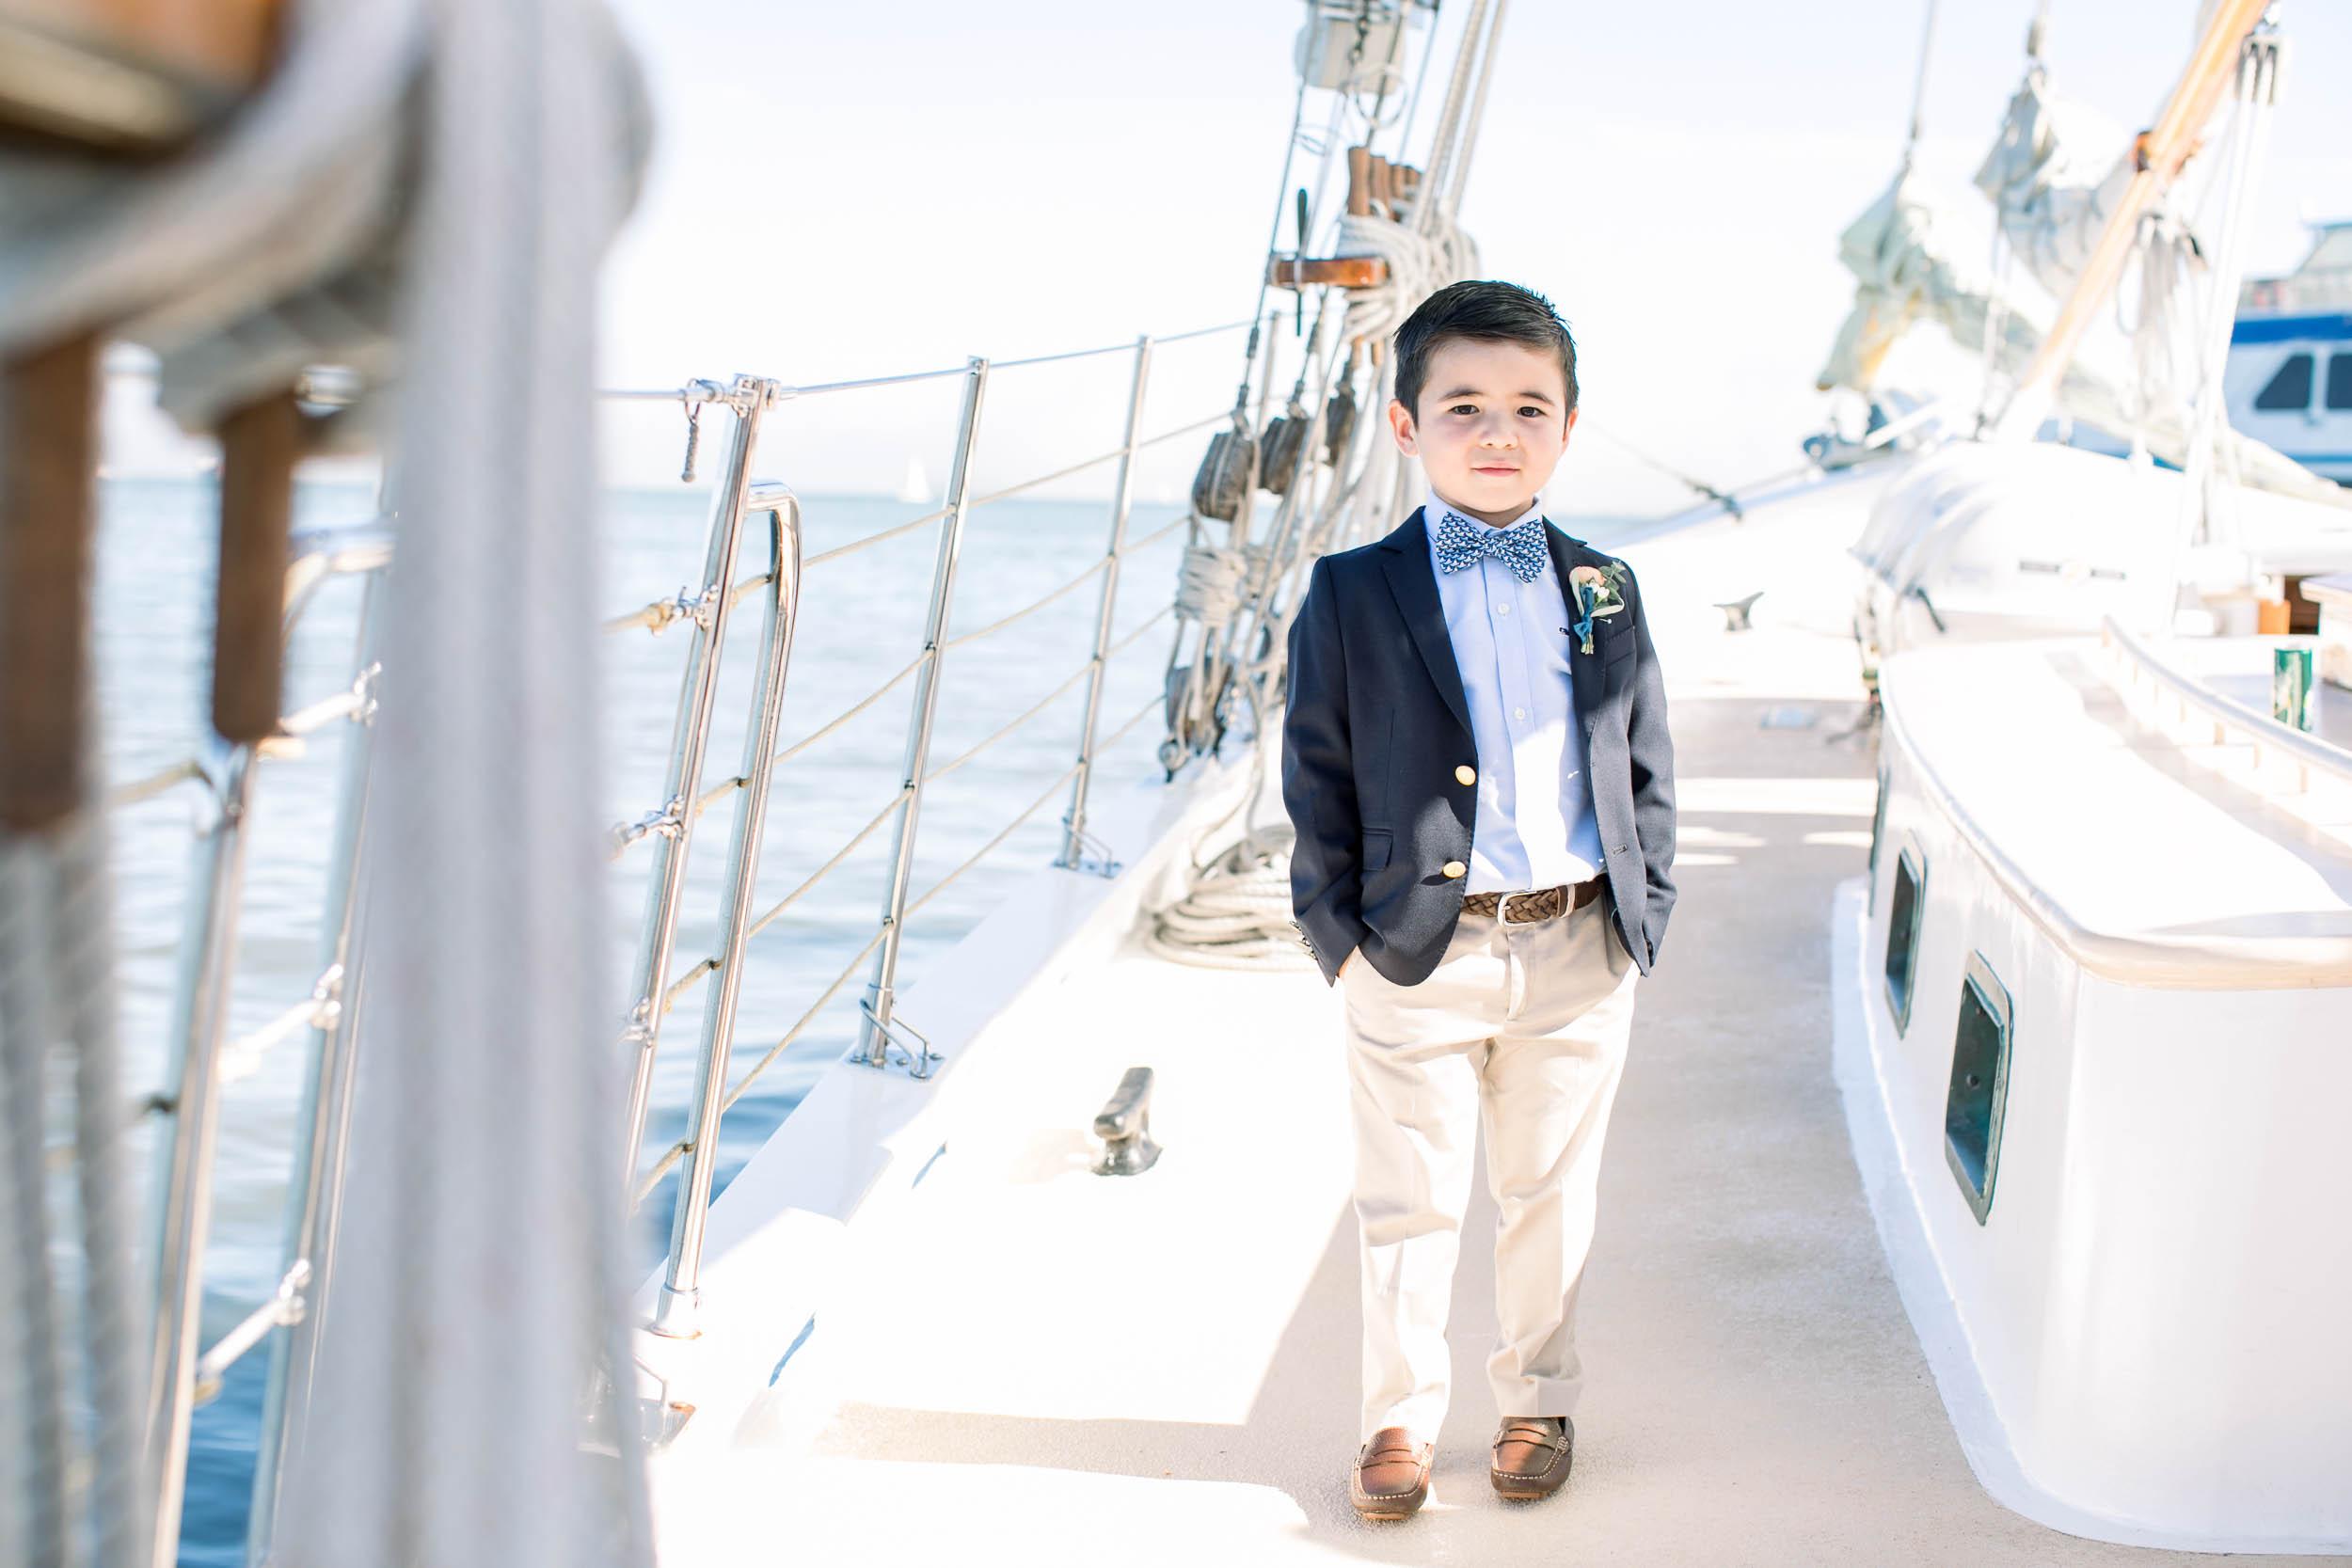 092218ER352_Sausalito Yacht Club Wedding_Buena Lane Photography.jpg